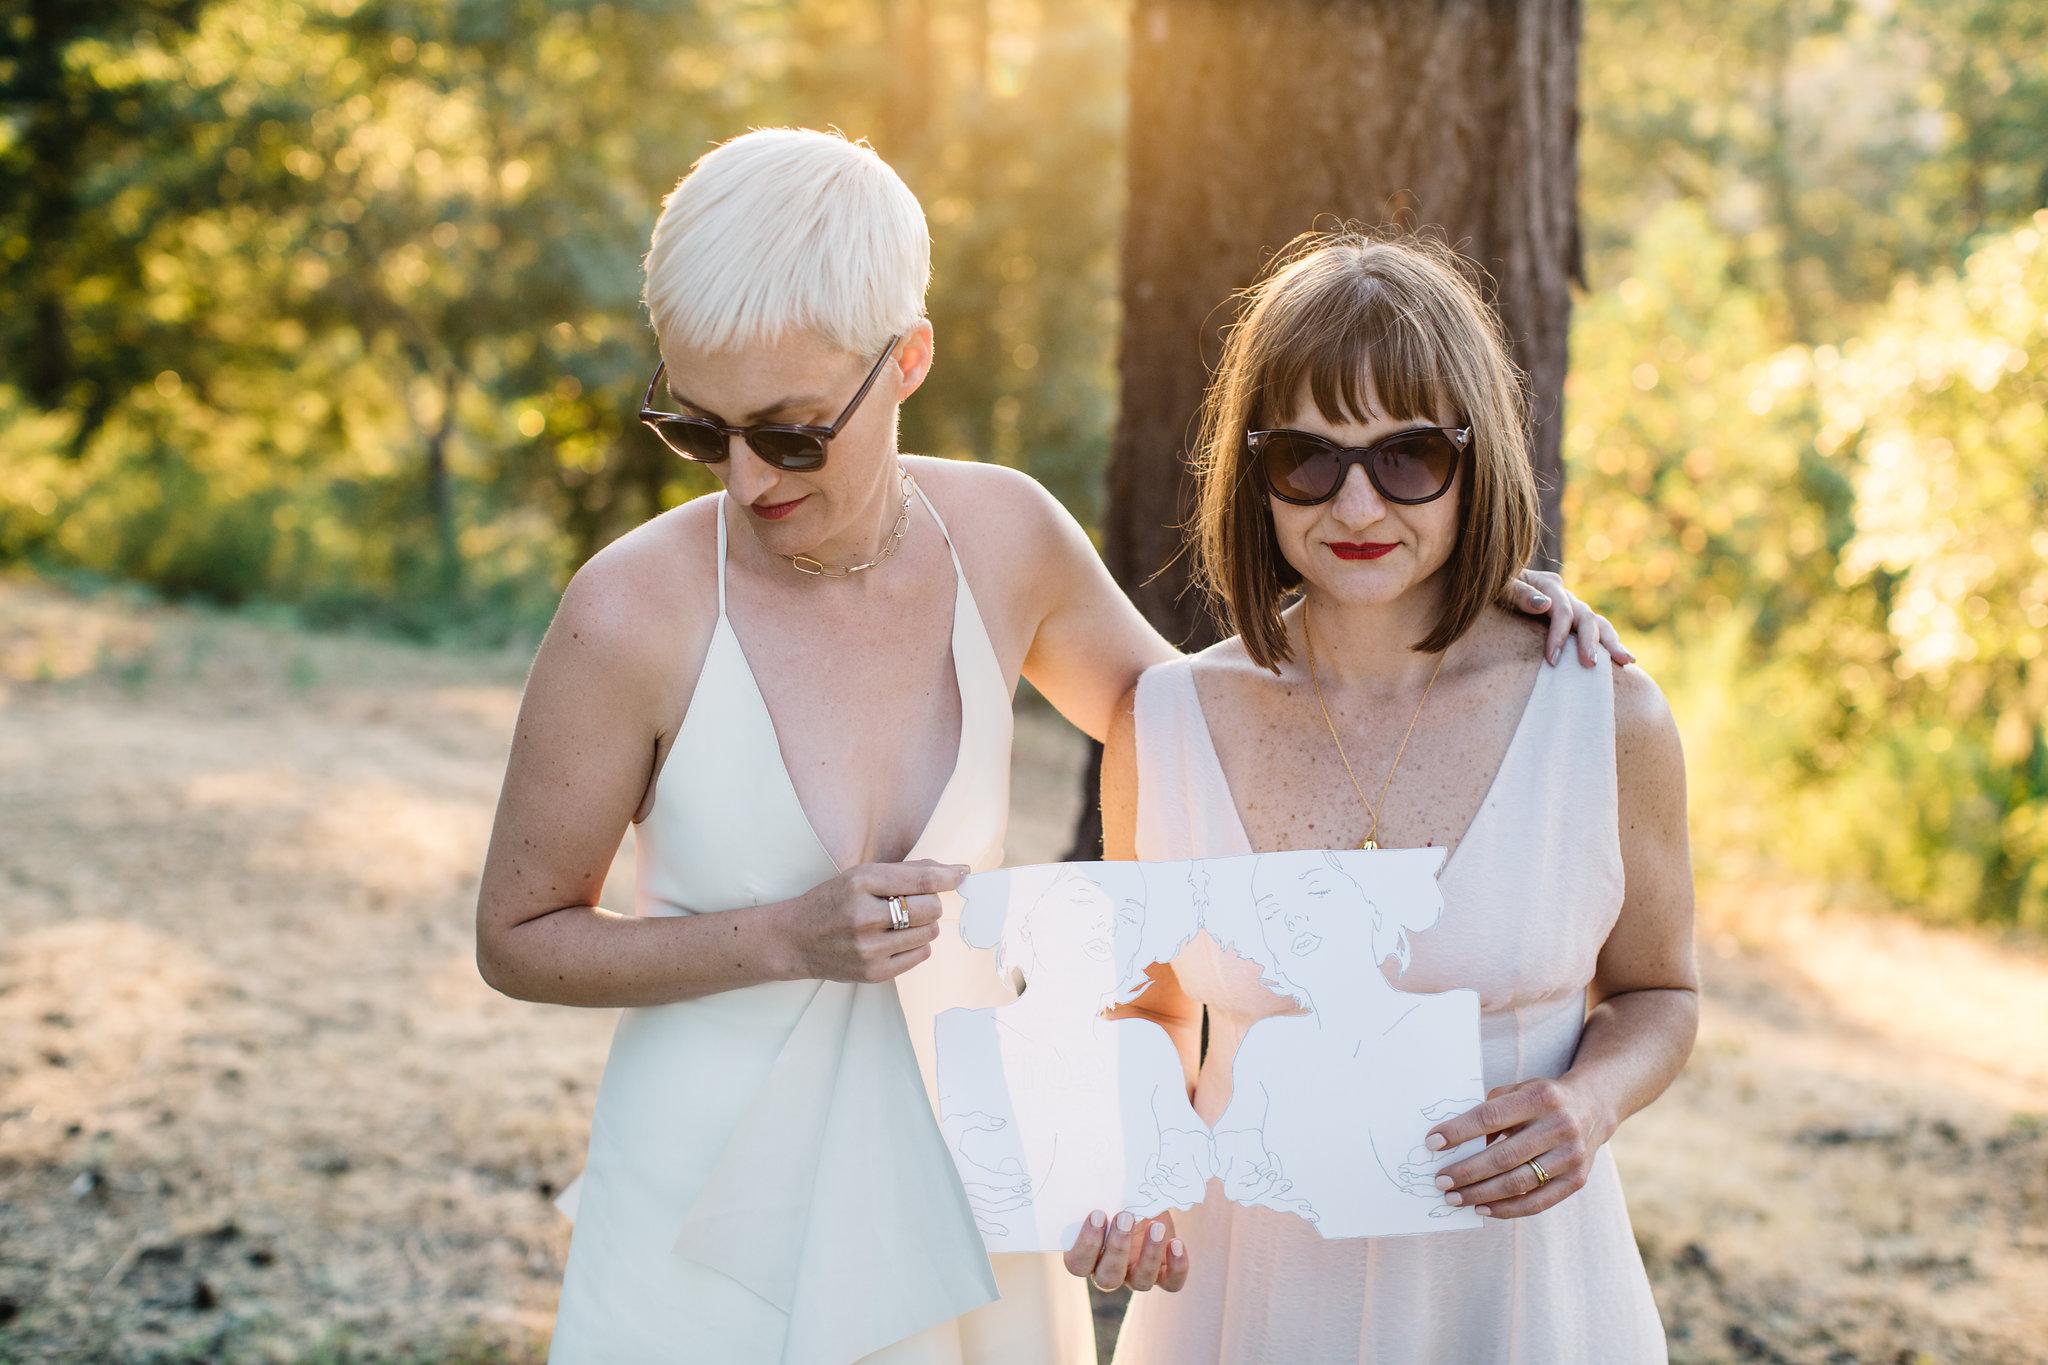 20170708_Brook+Evans_wedding_highres-505.jpg